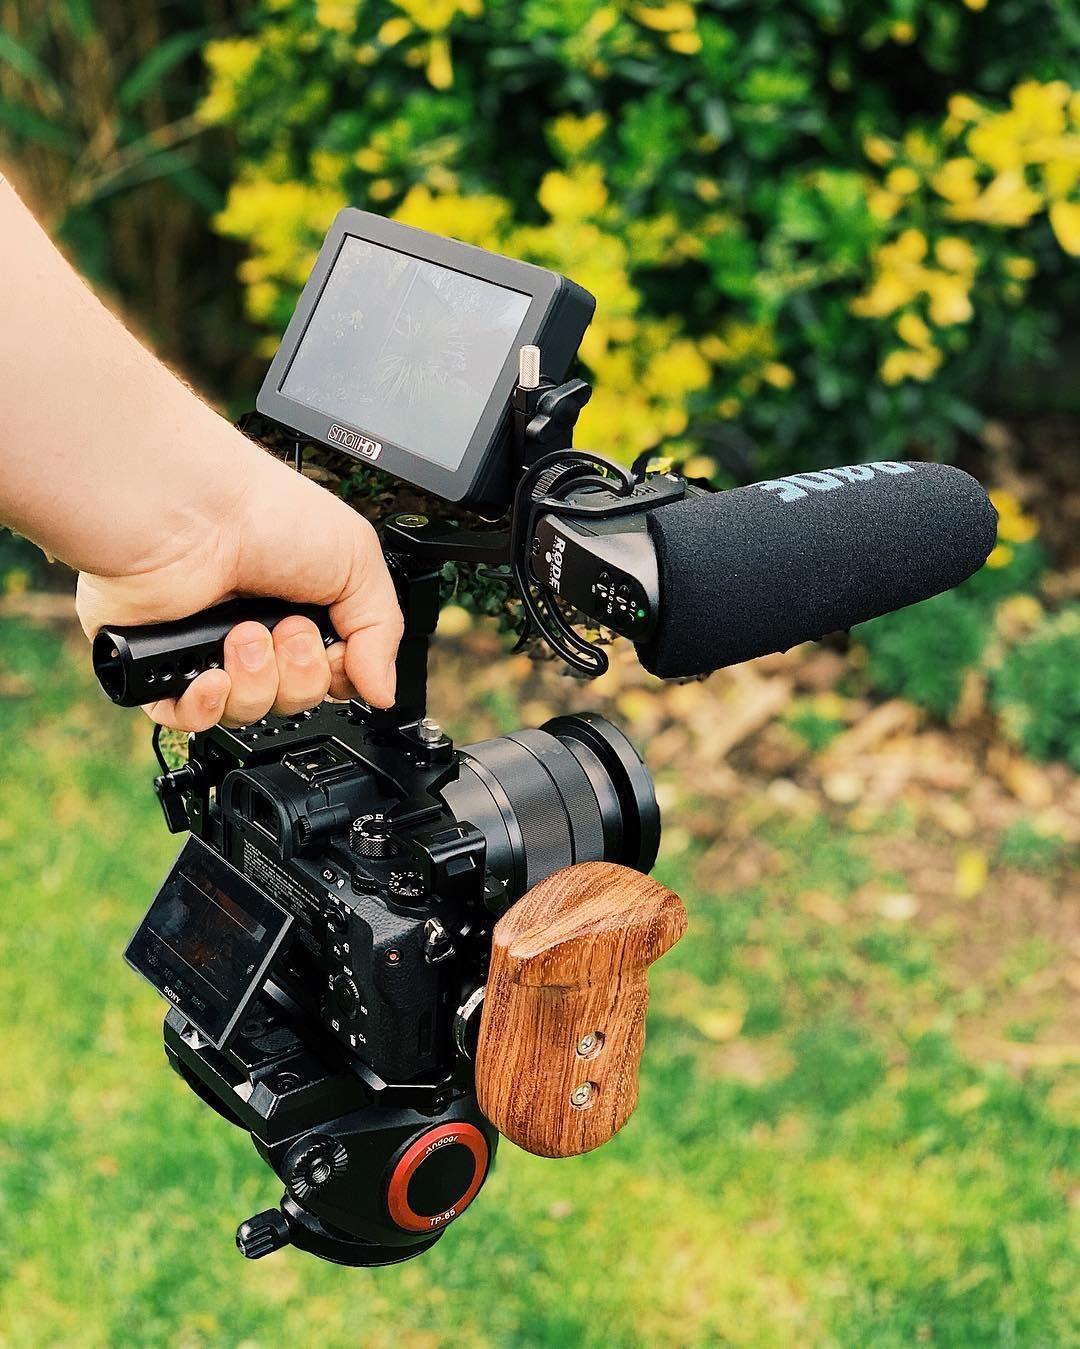 My Run & Gun professional camera set up